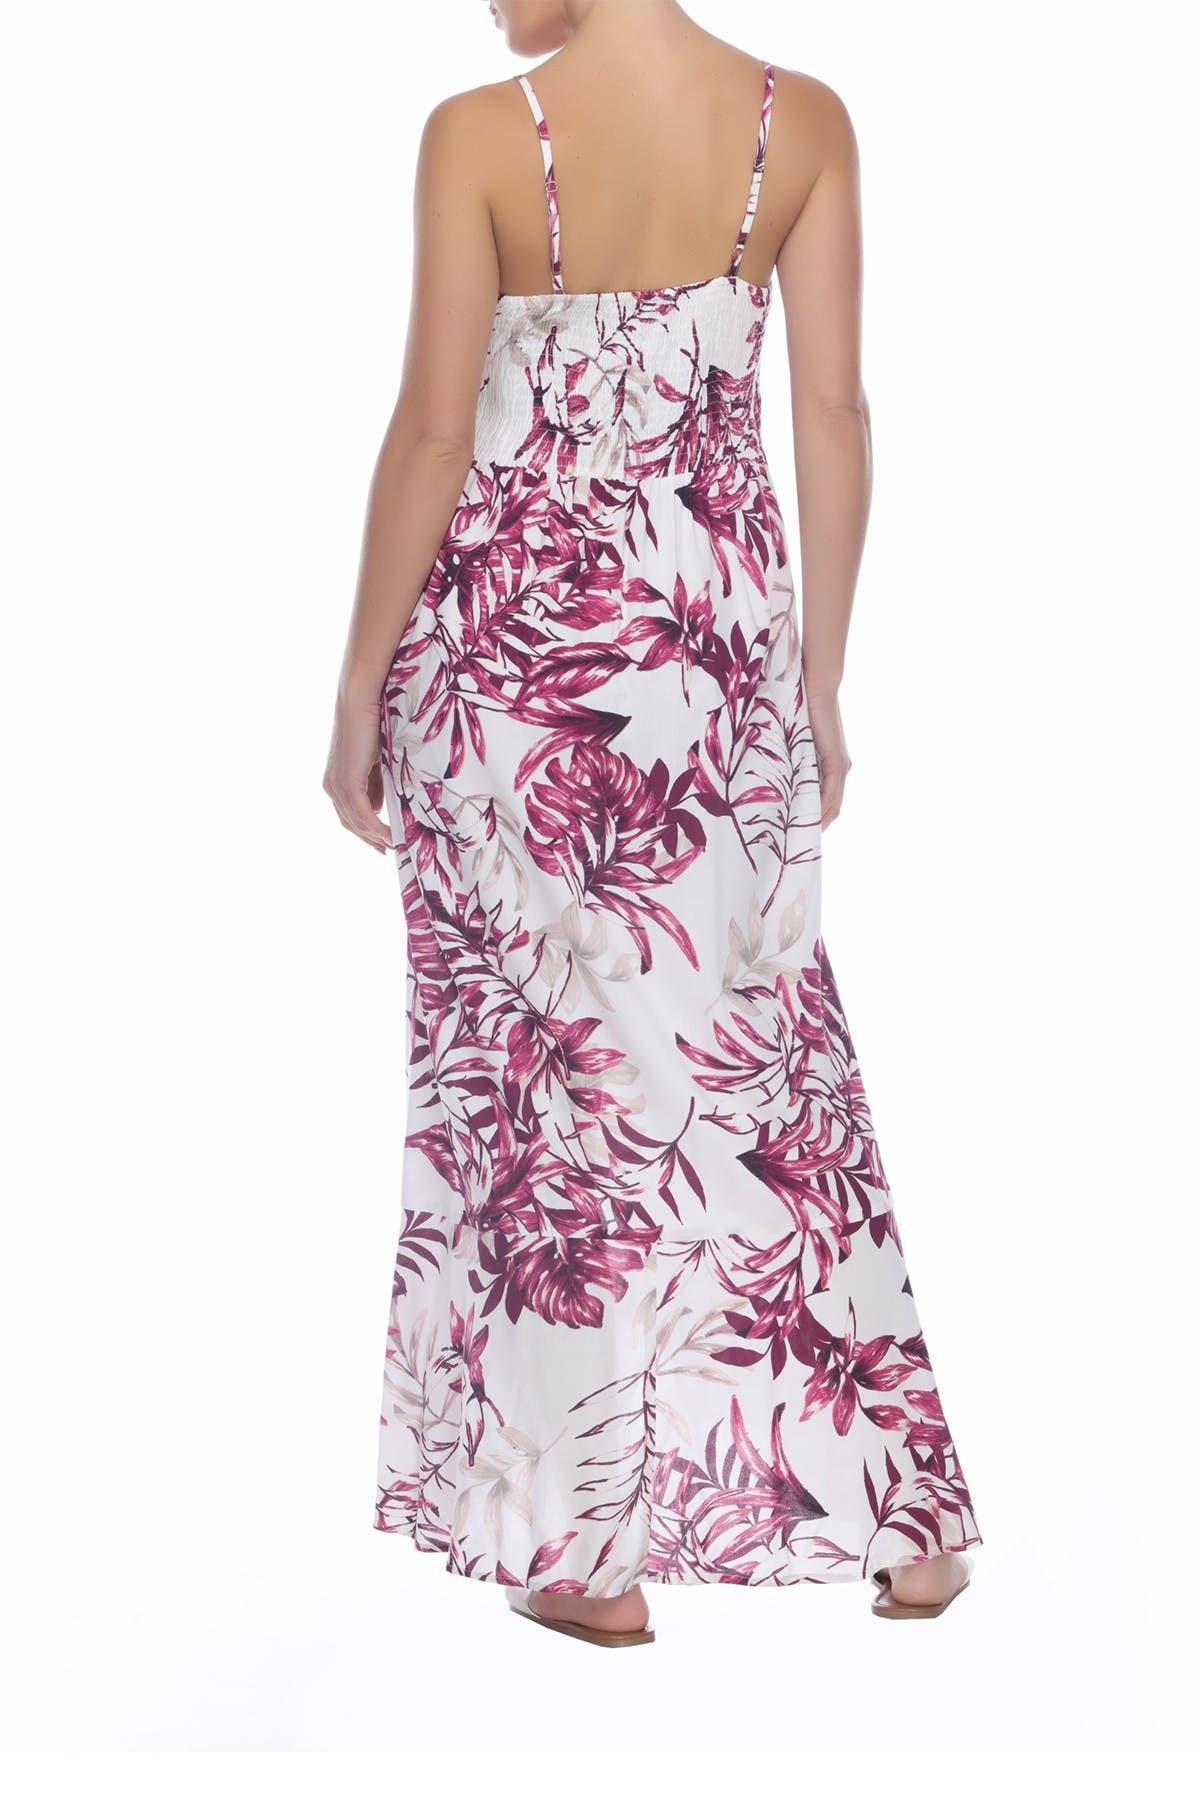 Image of BOHO ME Leaf Printed Hi-Lo Flounce Hem Dress